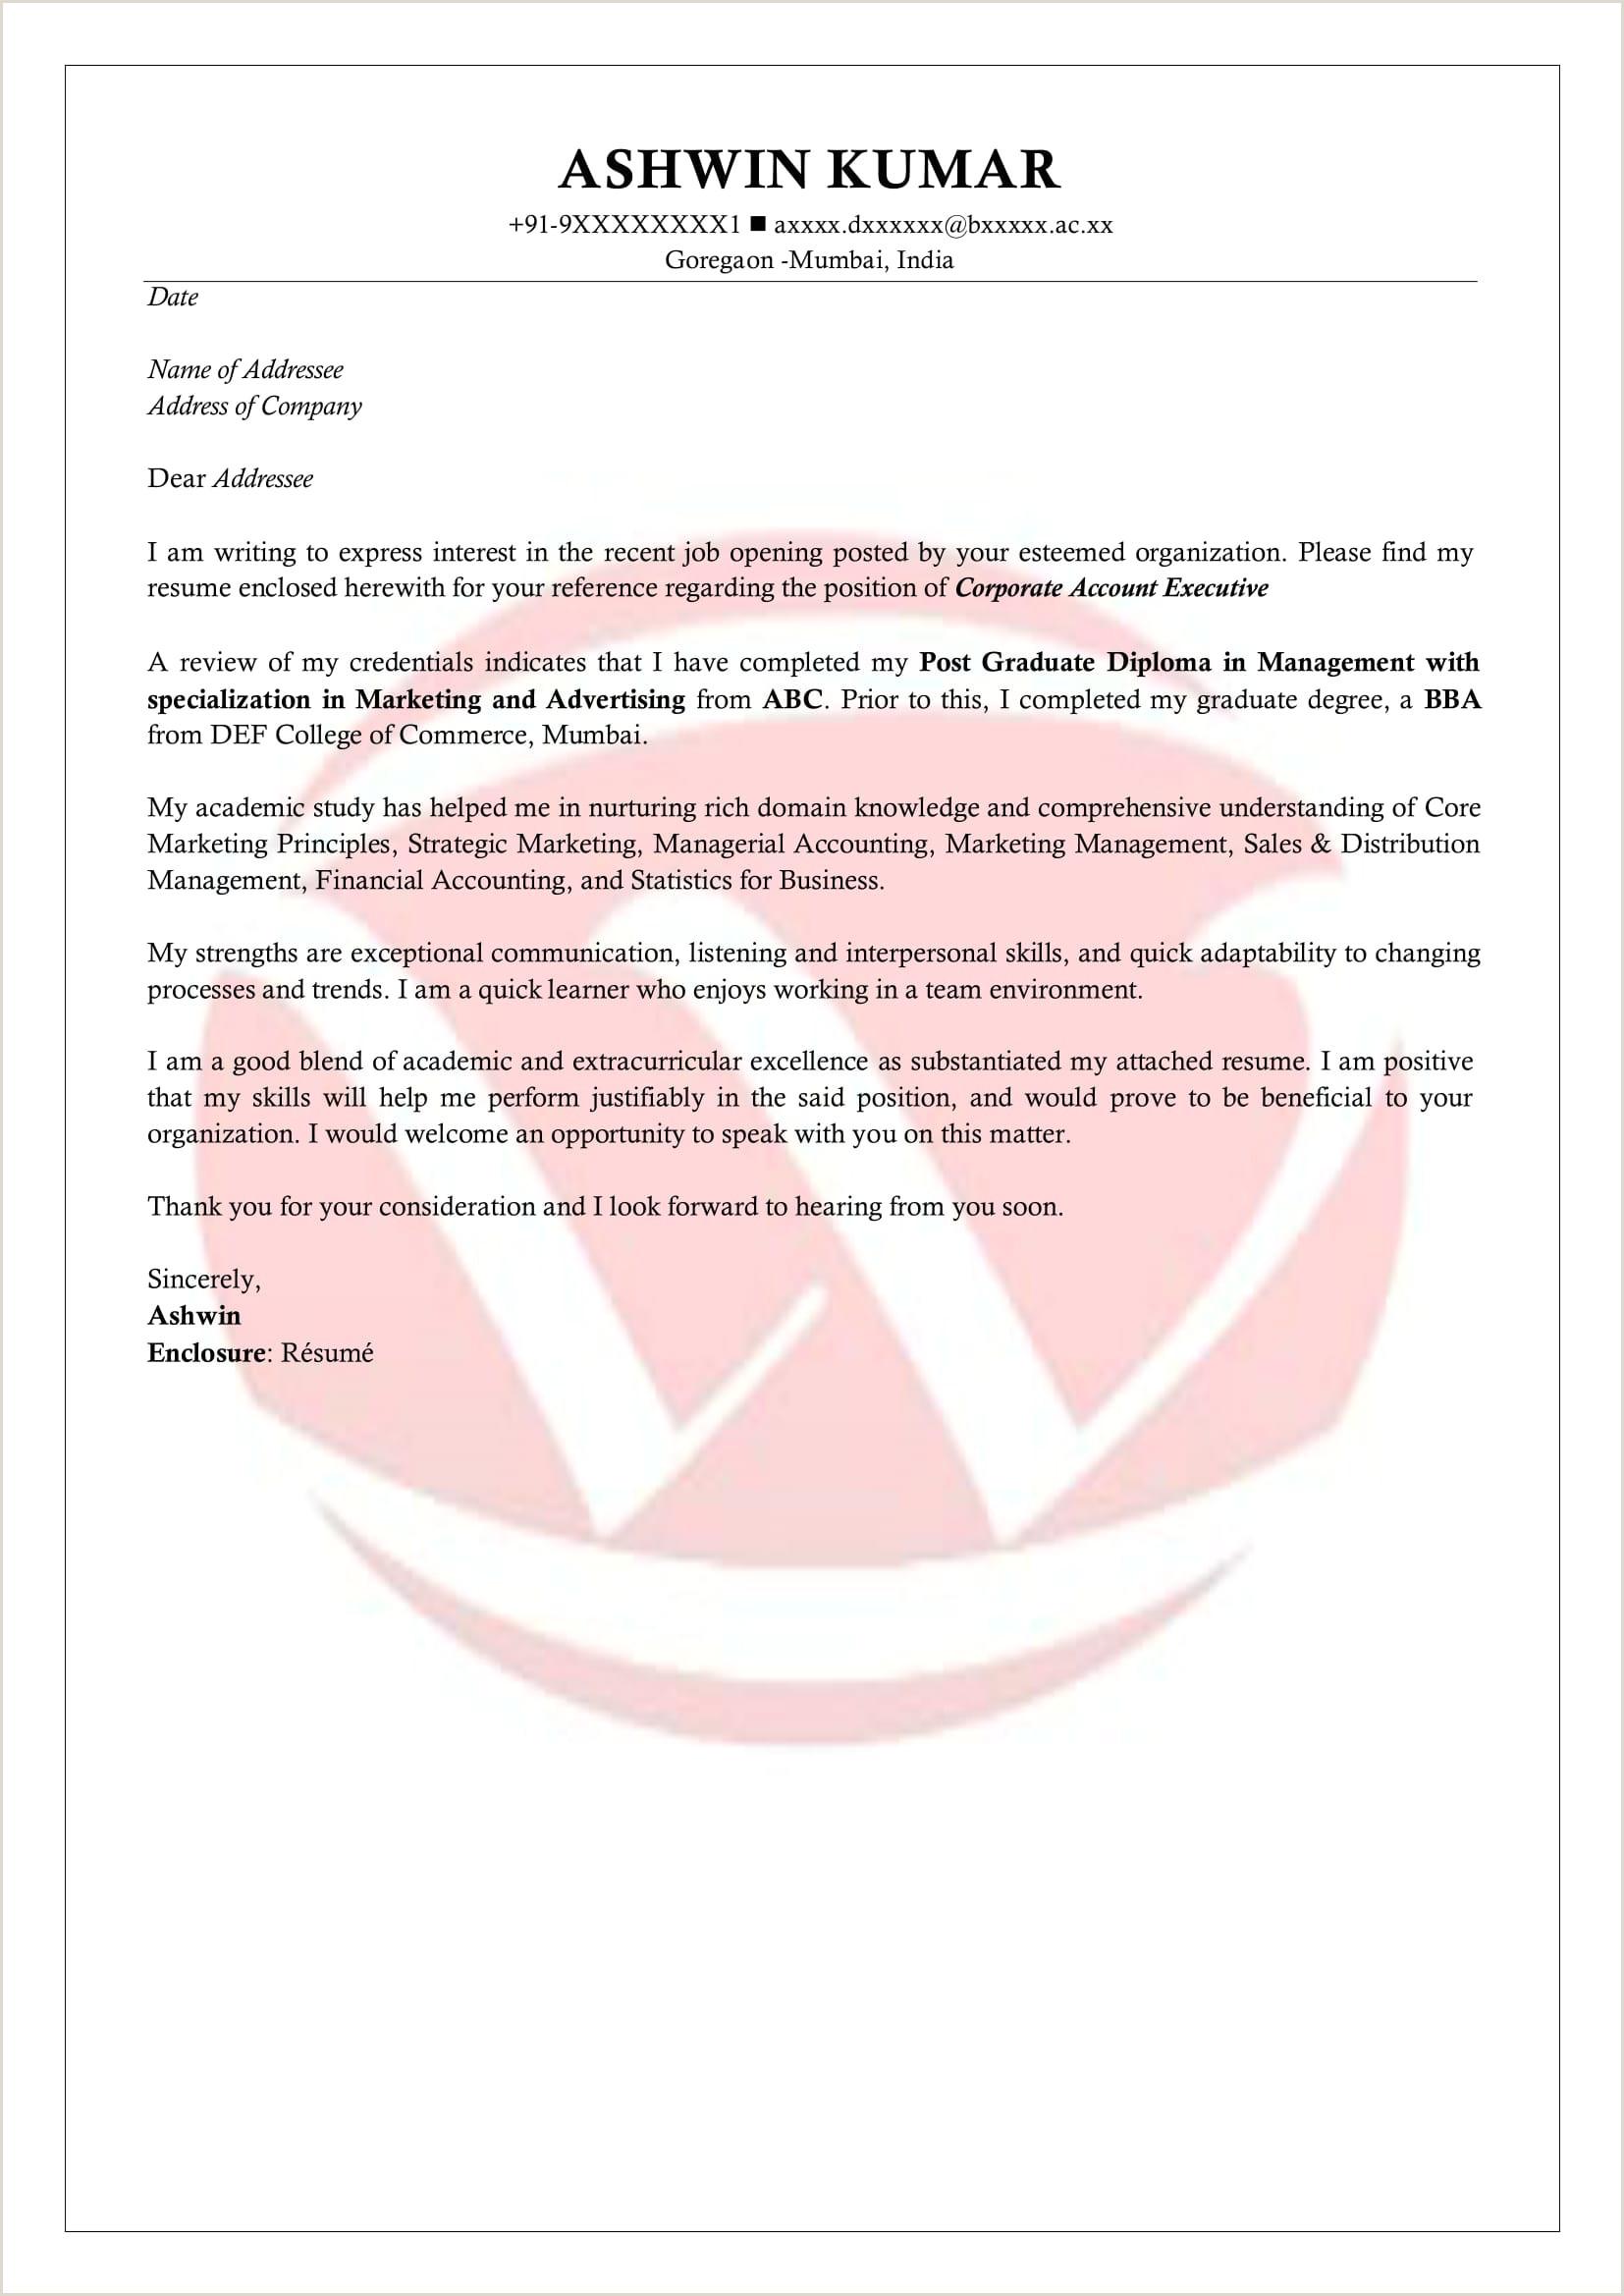 Fresher Resume Format For Lecturer Post Freshers Sample Cover Letter Format Download Cover Letter